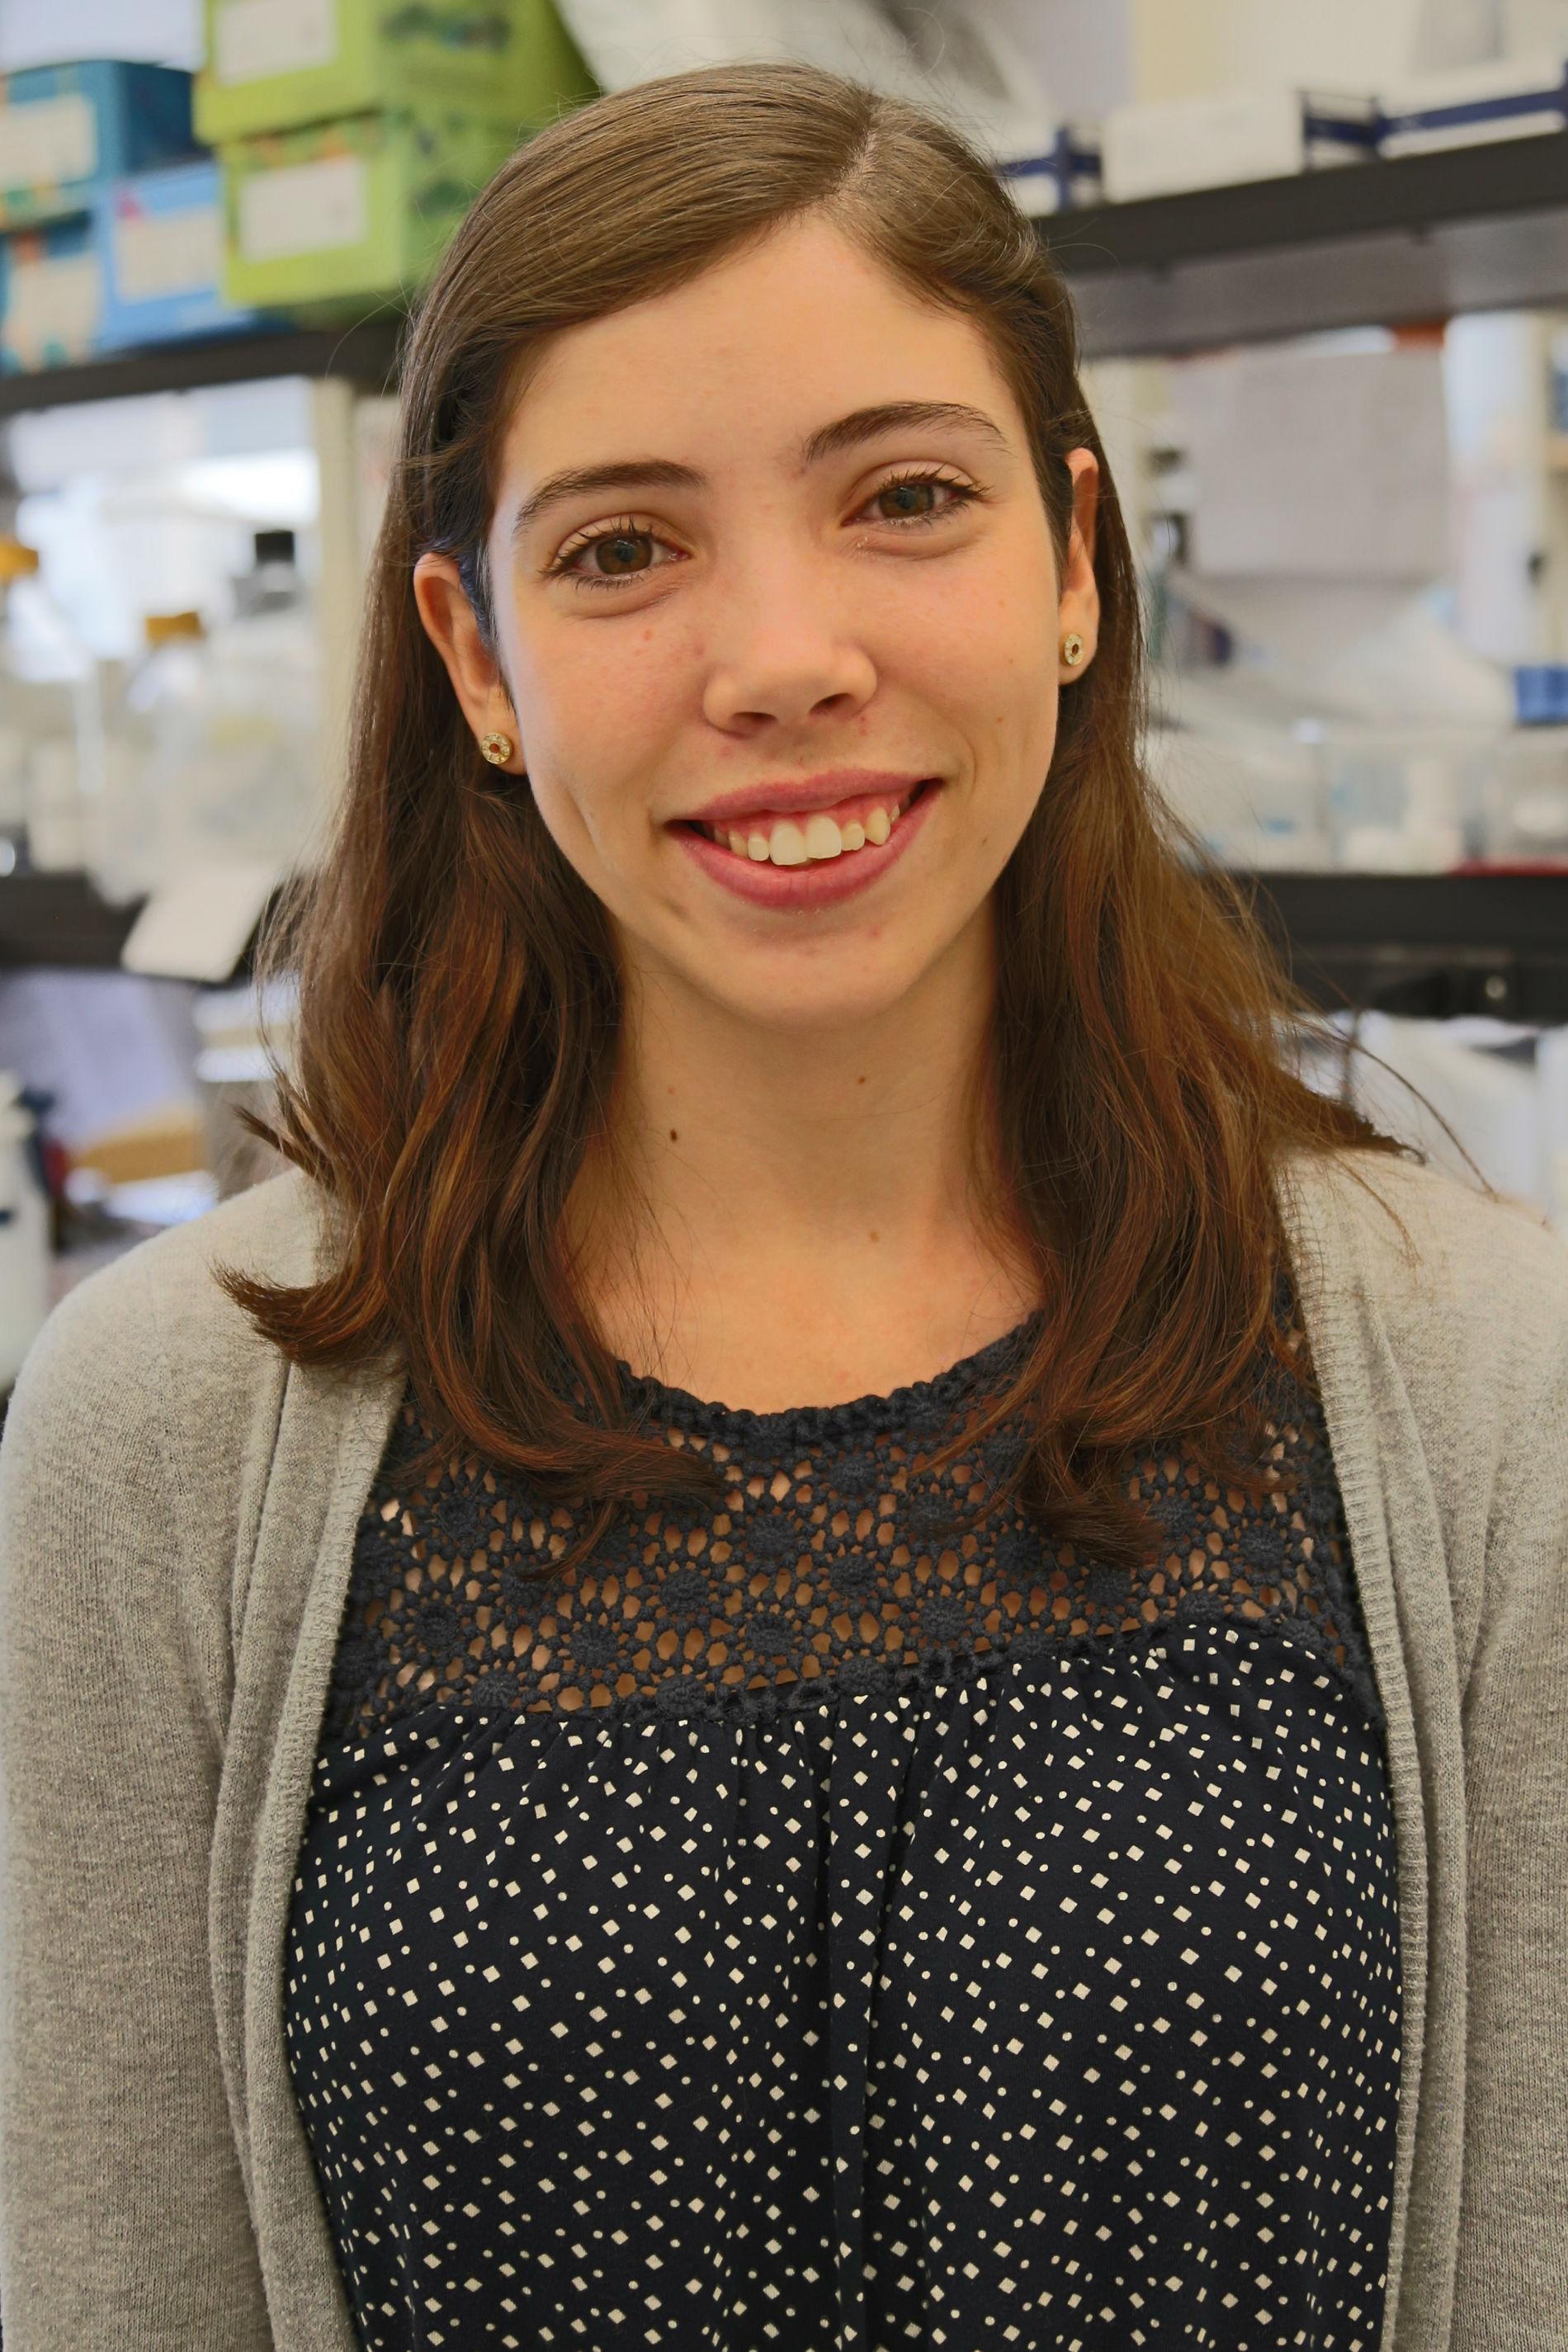 Sarah Perlee - Research Technician